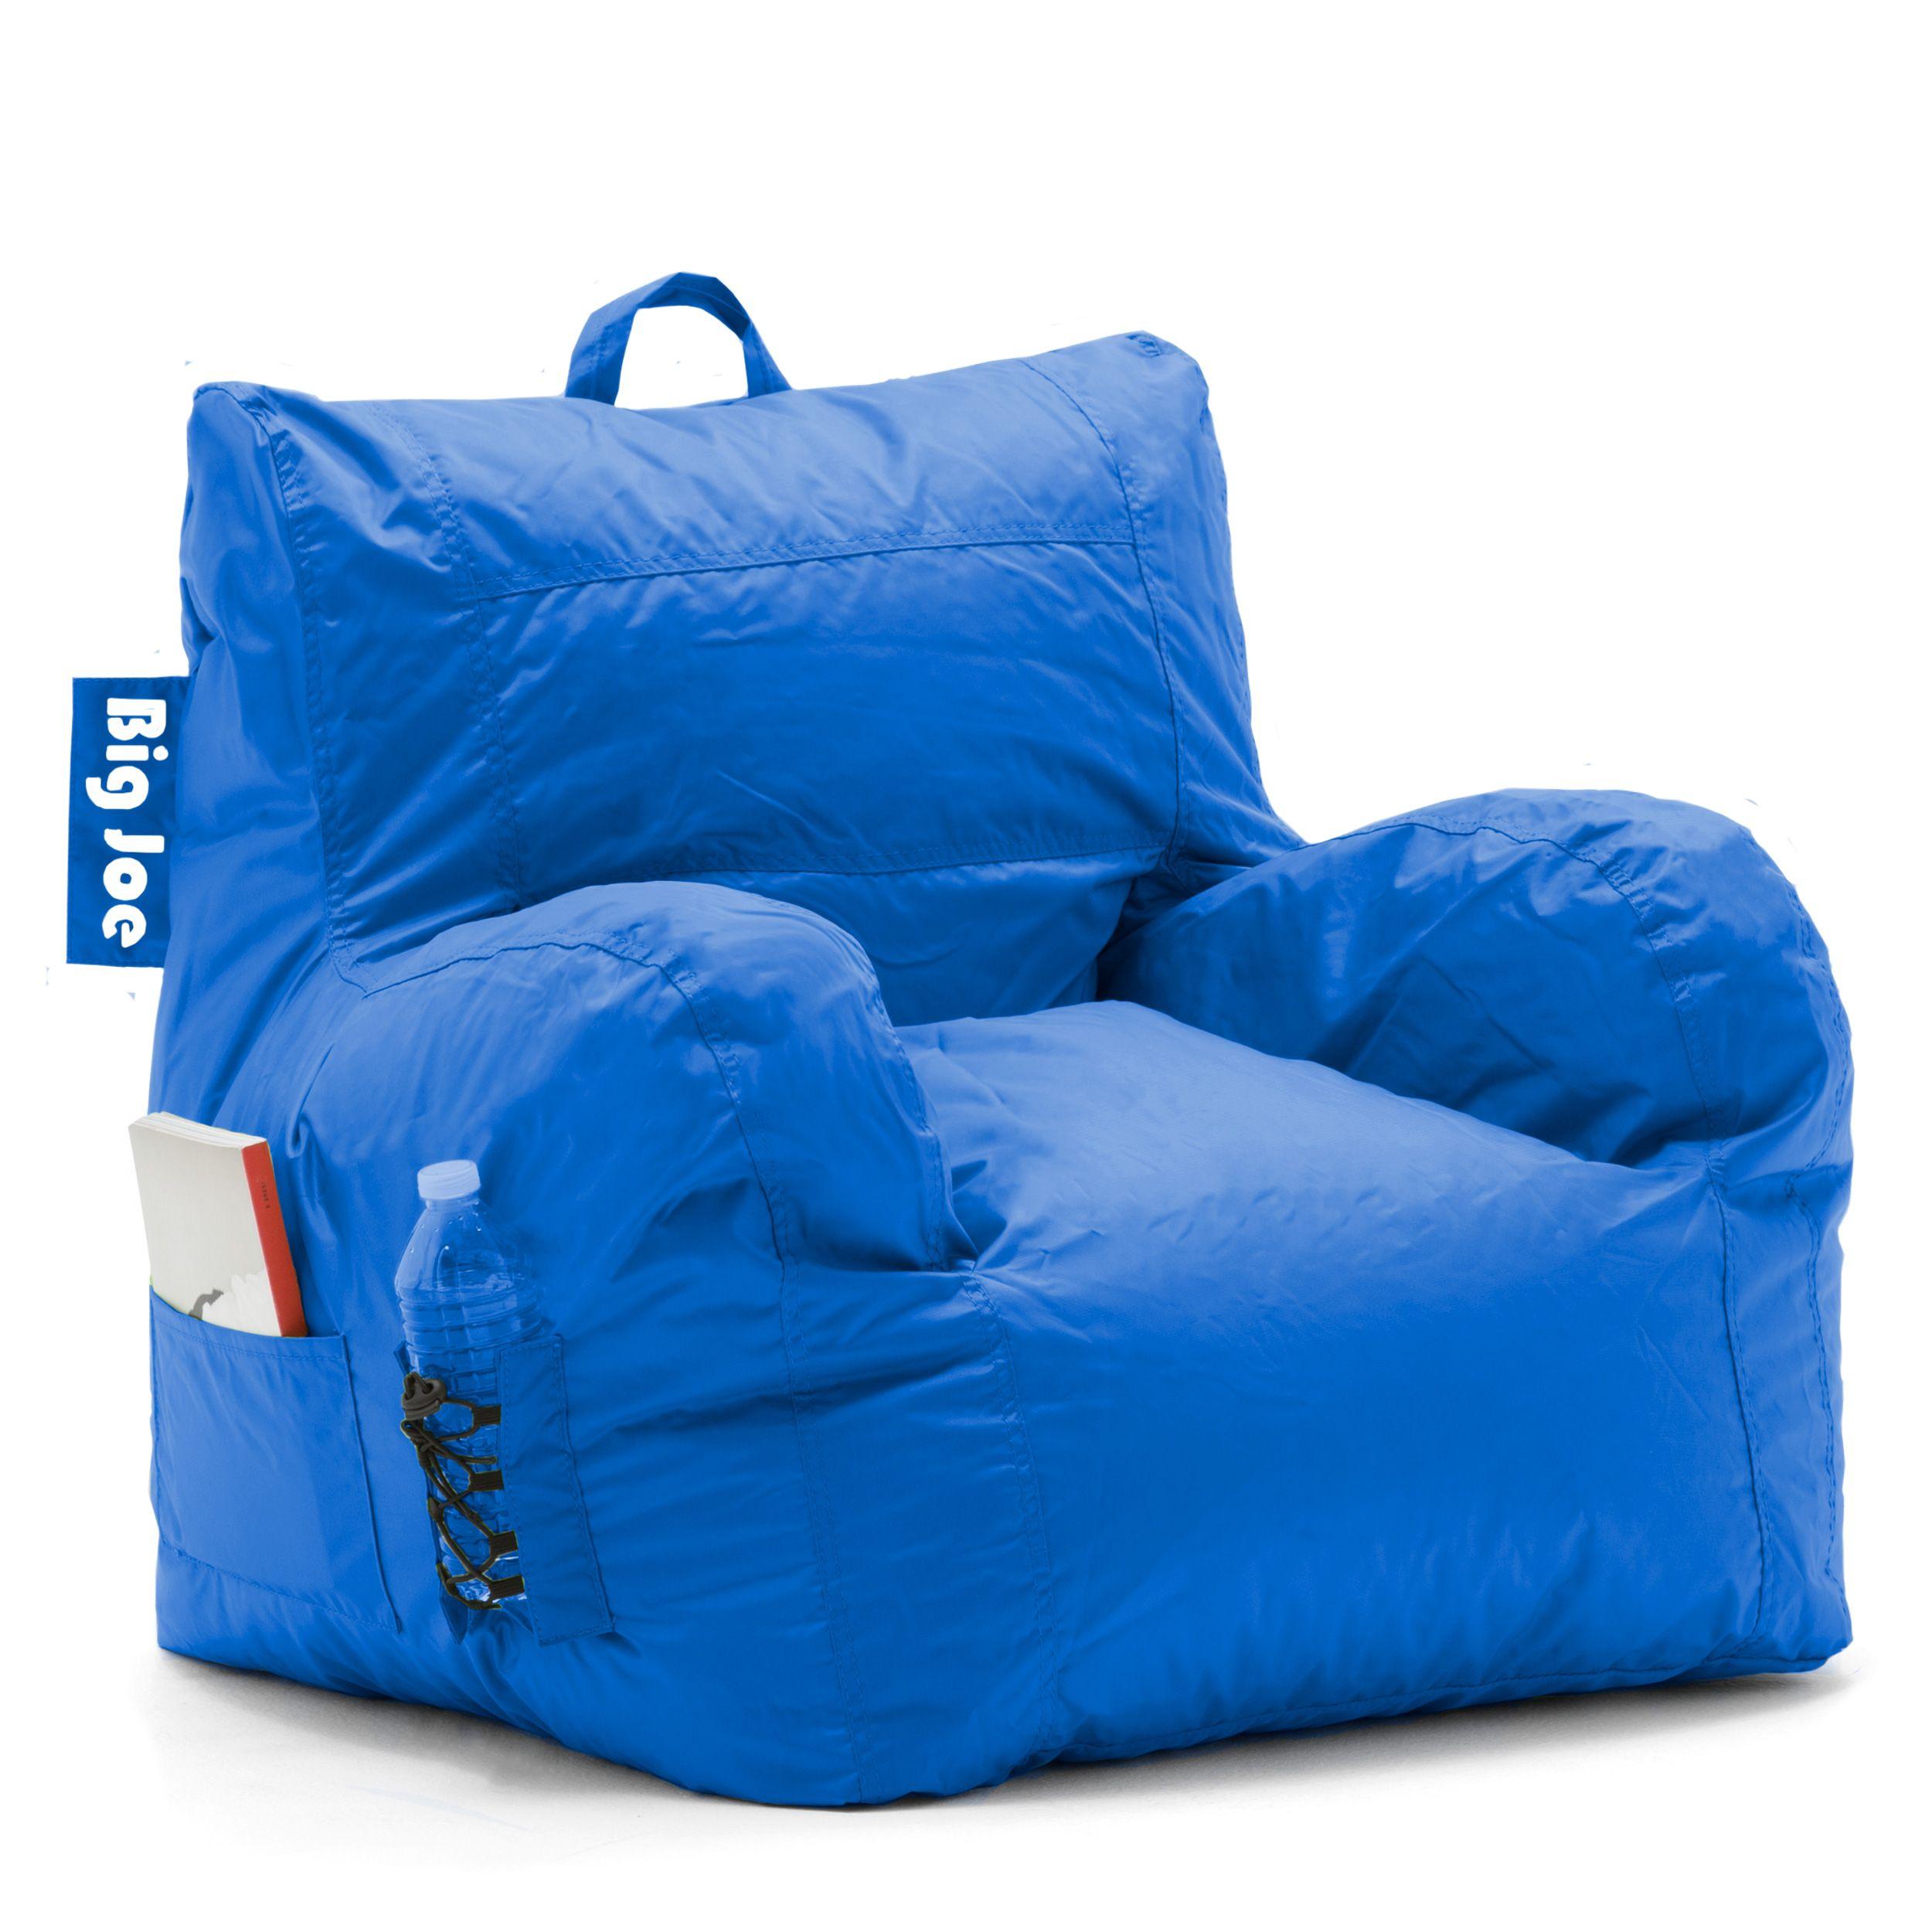 Big Joe Bean Bag Chair Multiple Colors 33 X 32 X 25 Bag